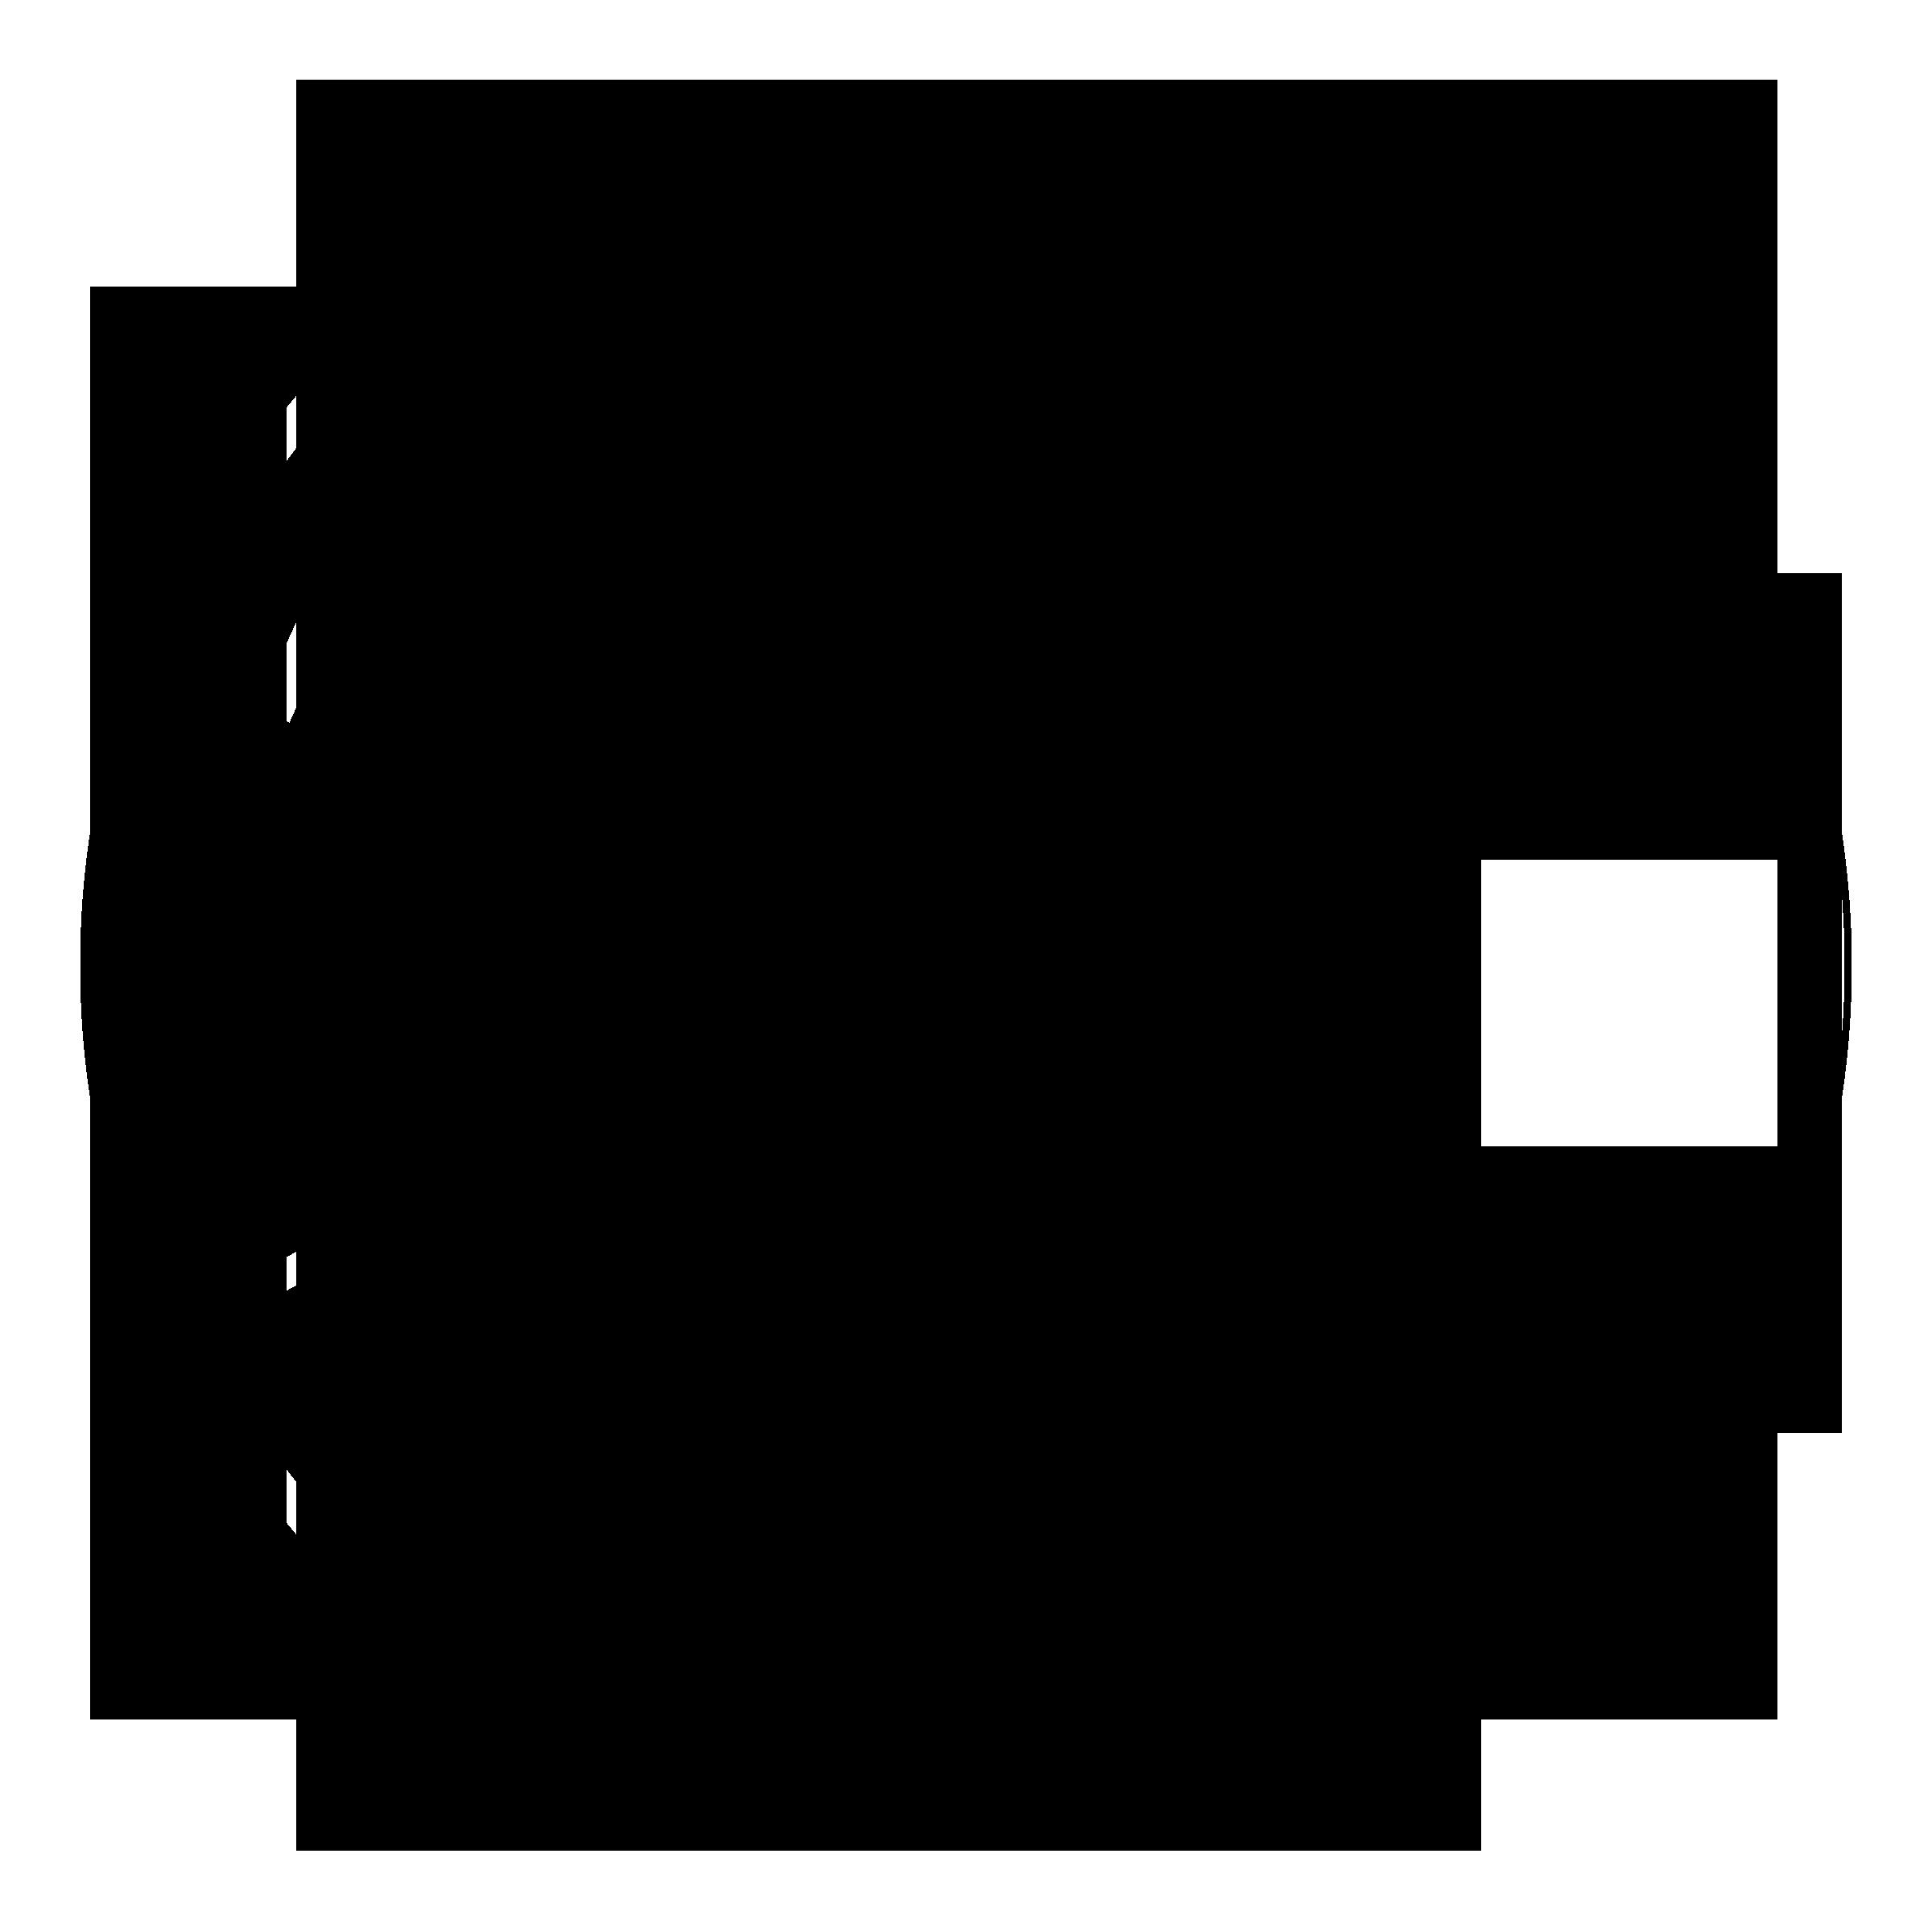 2400x2400 Now Toronto Raptors Logo Coloring Page Png Transparent Vector